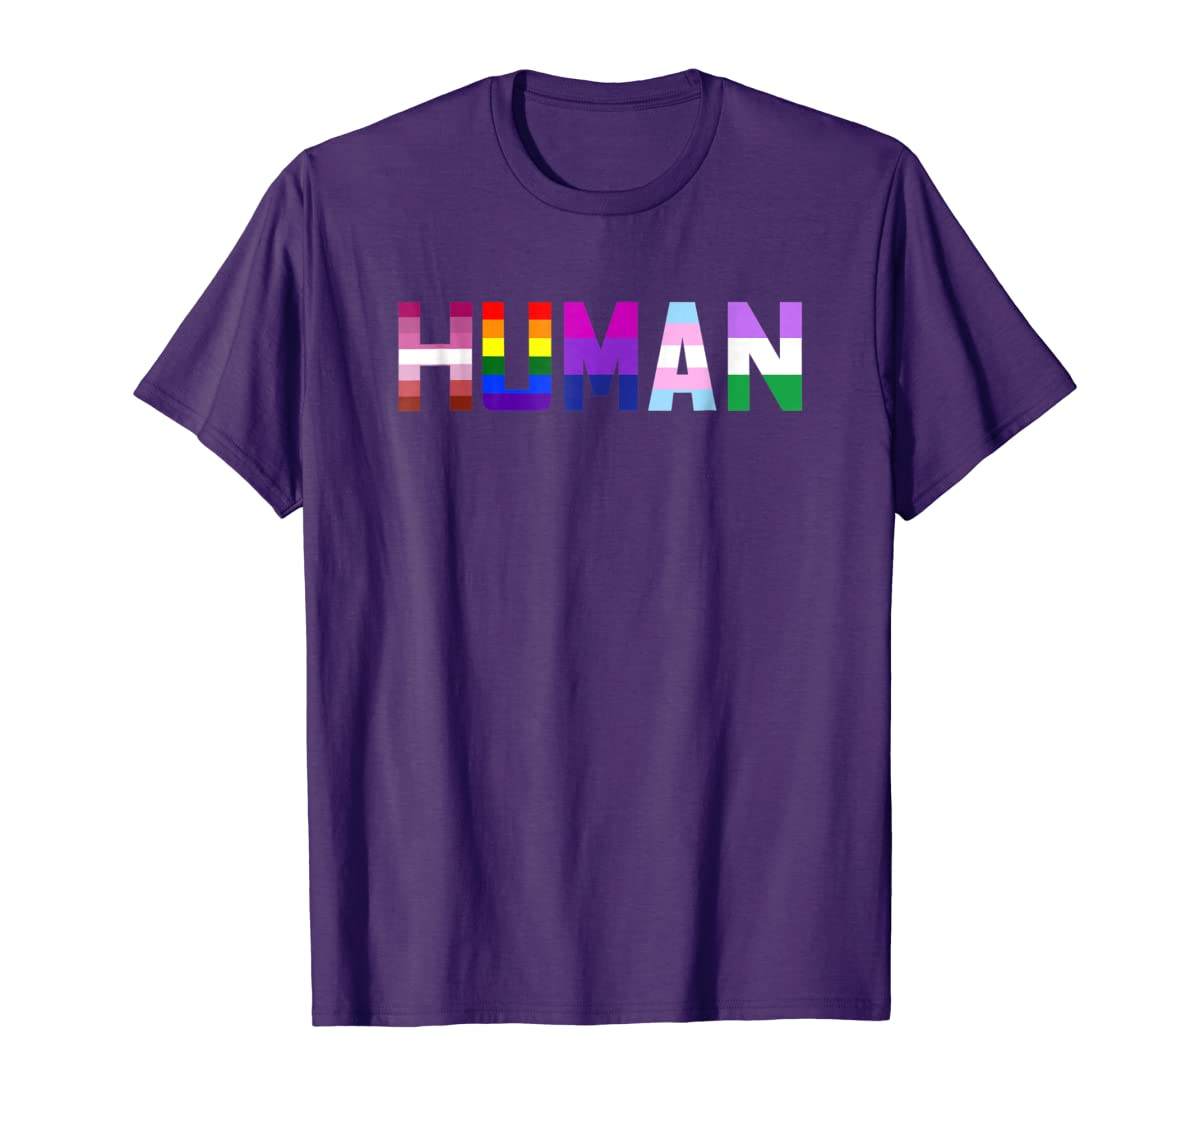 HUMAN Flag LGBT Gay Pride Month Transgender Ally T Shirt-Men's T-Shirt-Purple